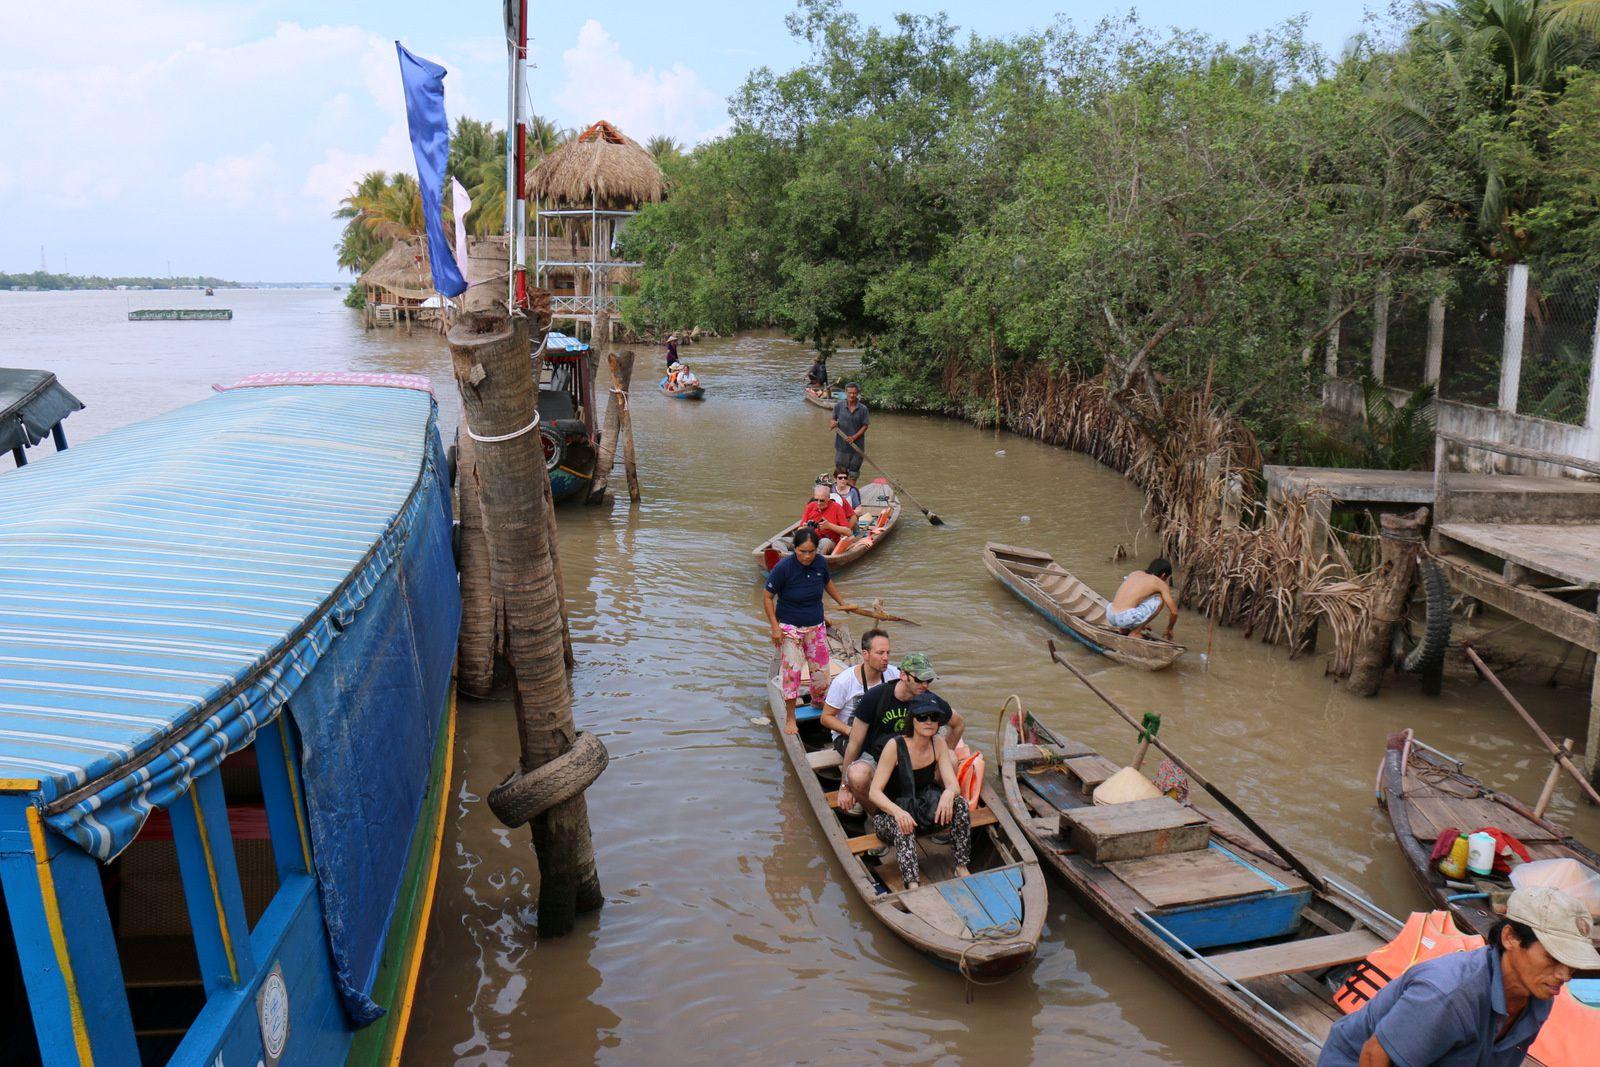 Balade en barque à An khanh, province de Ben Tre au Vietnam